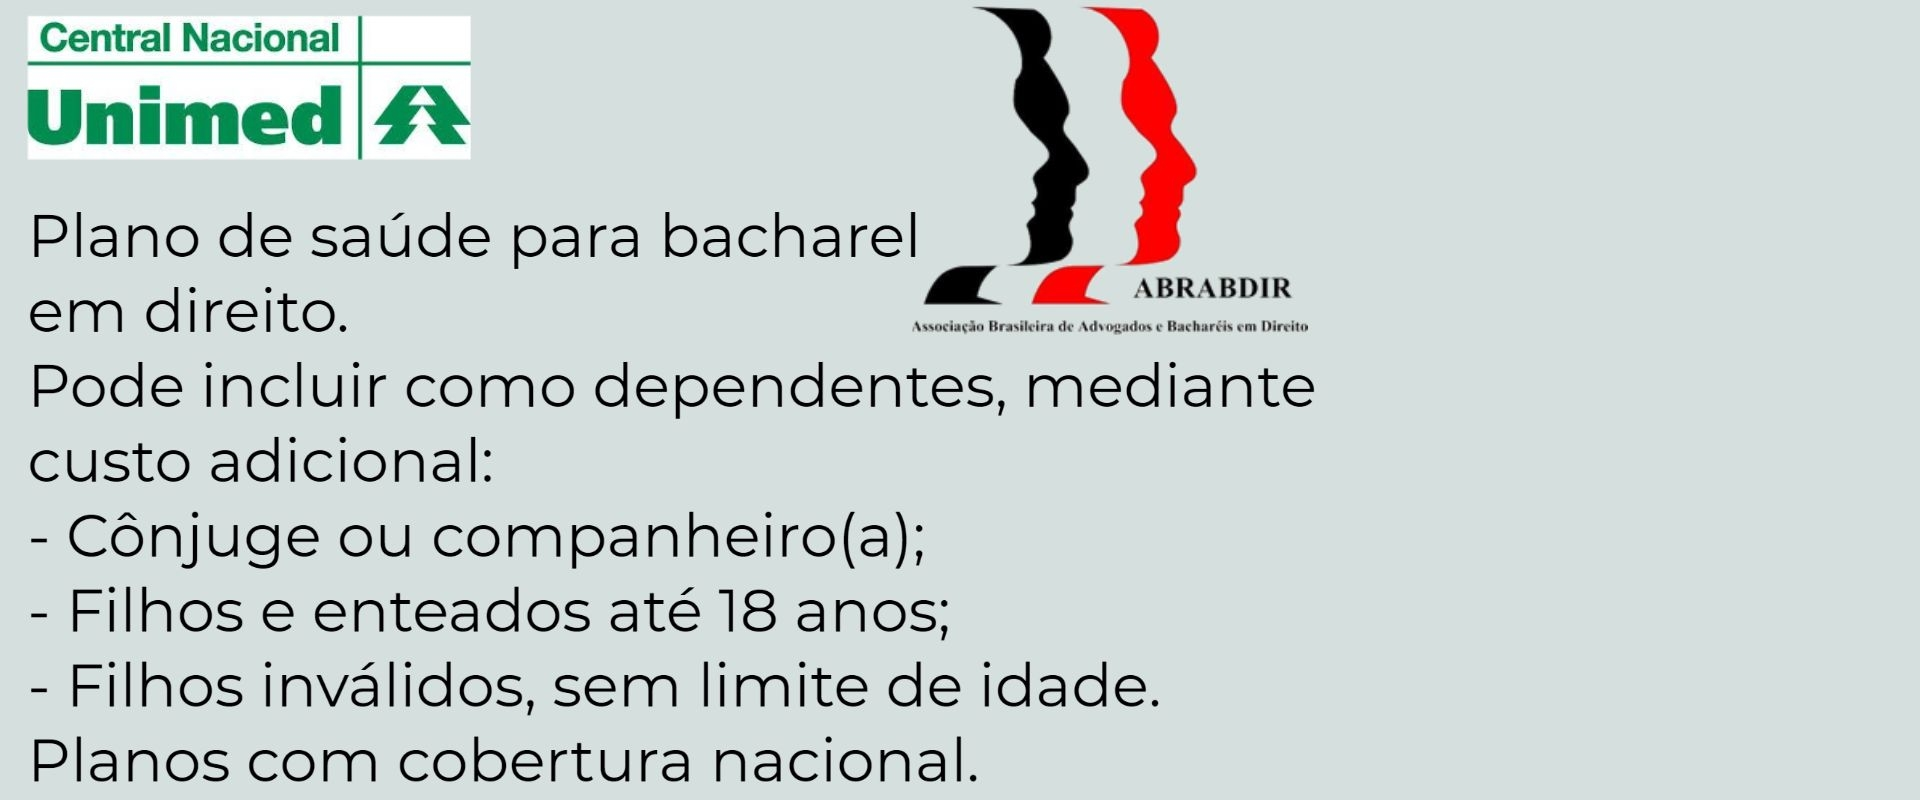 Unimed ABRABDIR Avaré